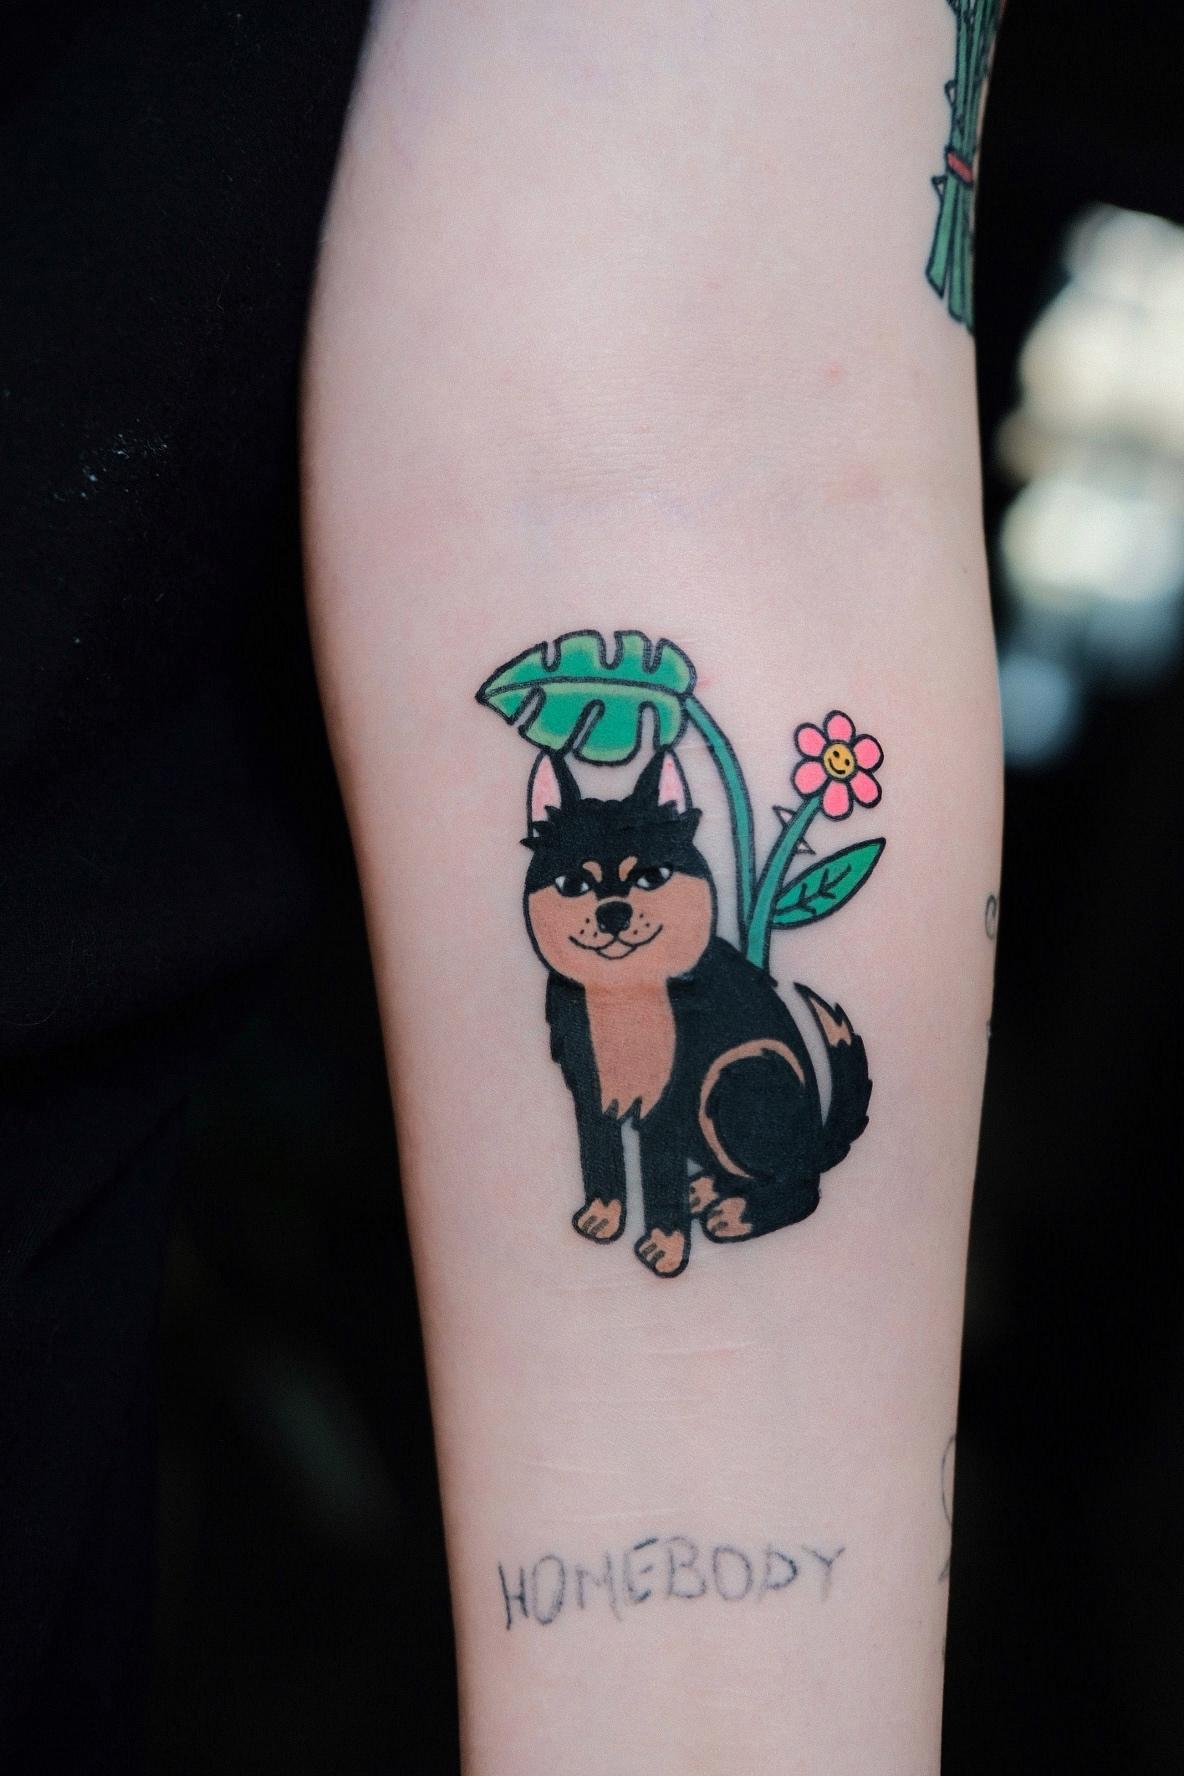 Inksearch tattoo Glossy Future